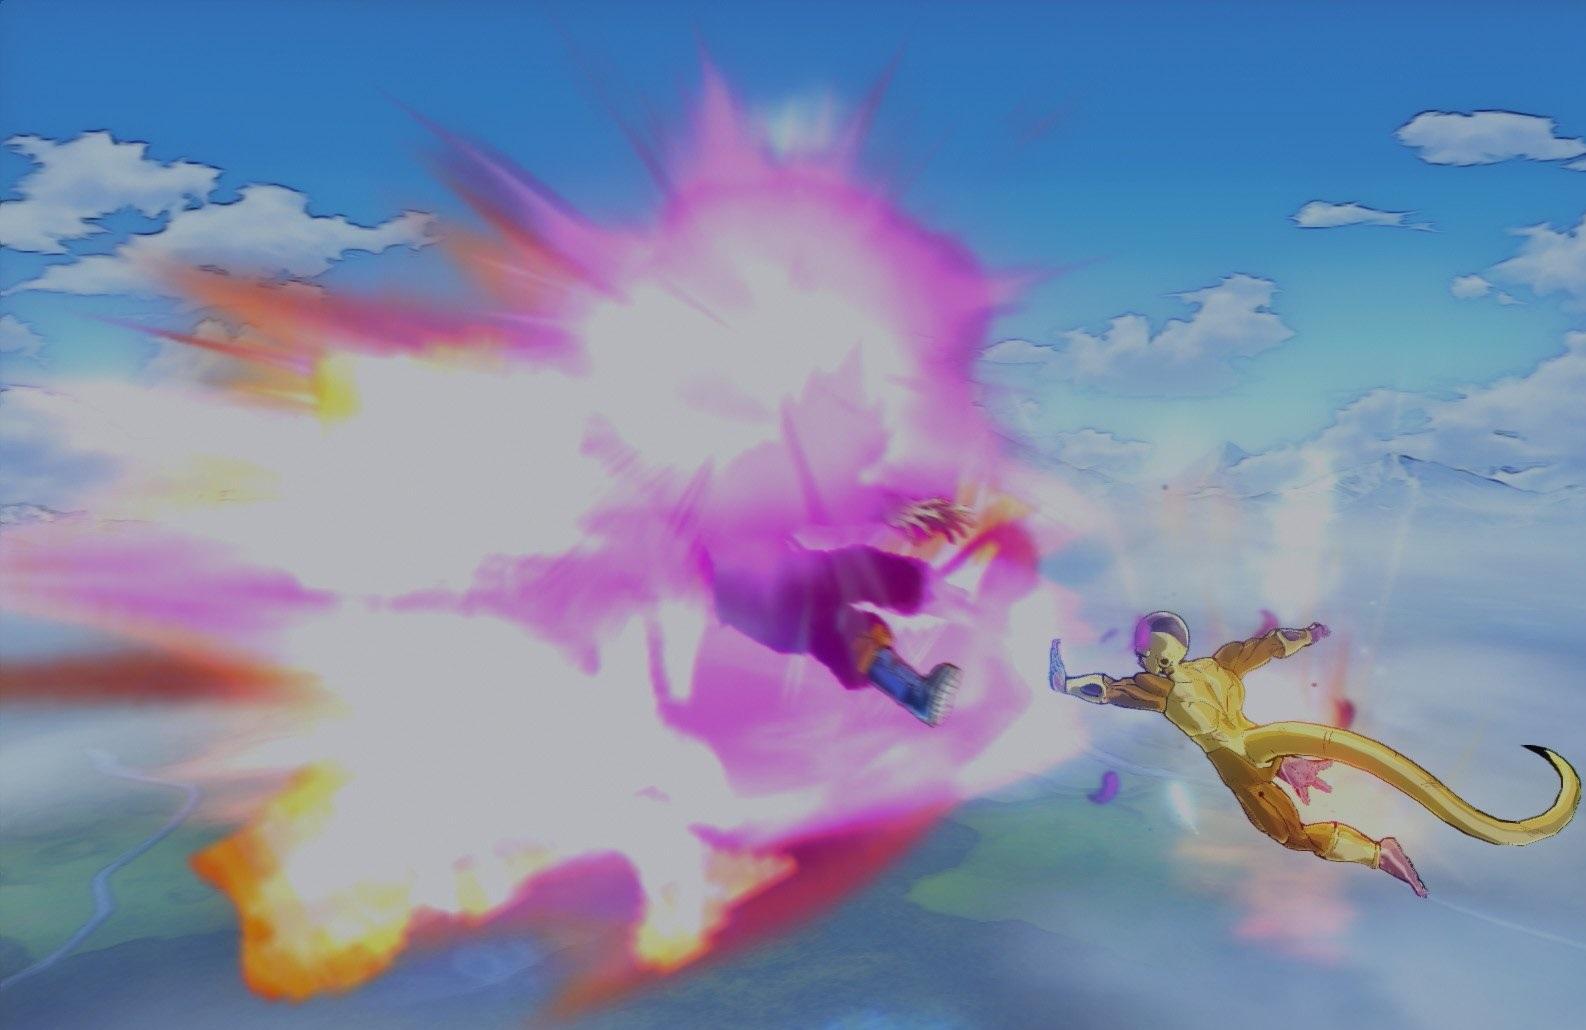 Emperor's Blast